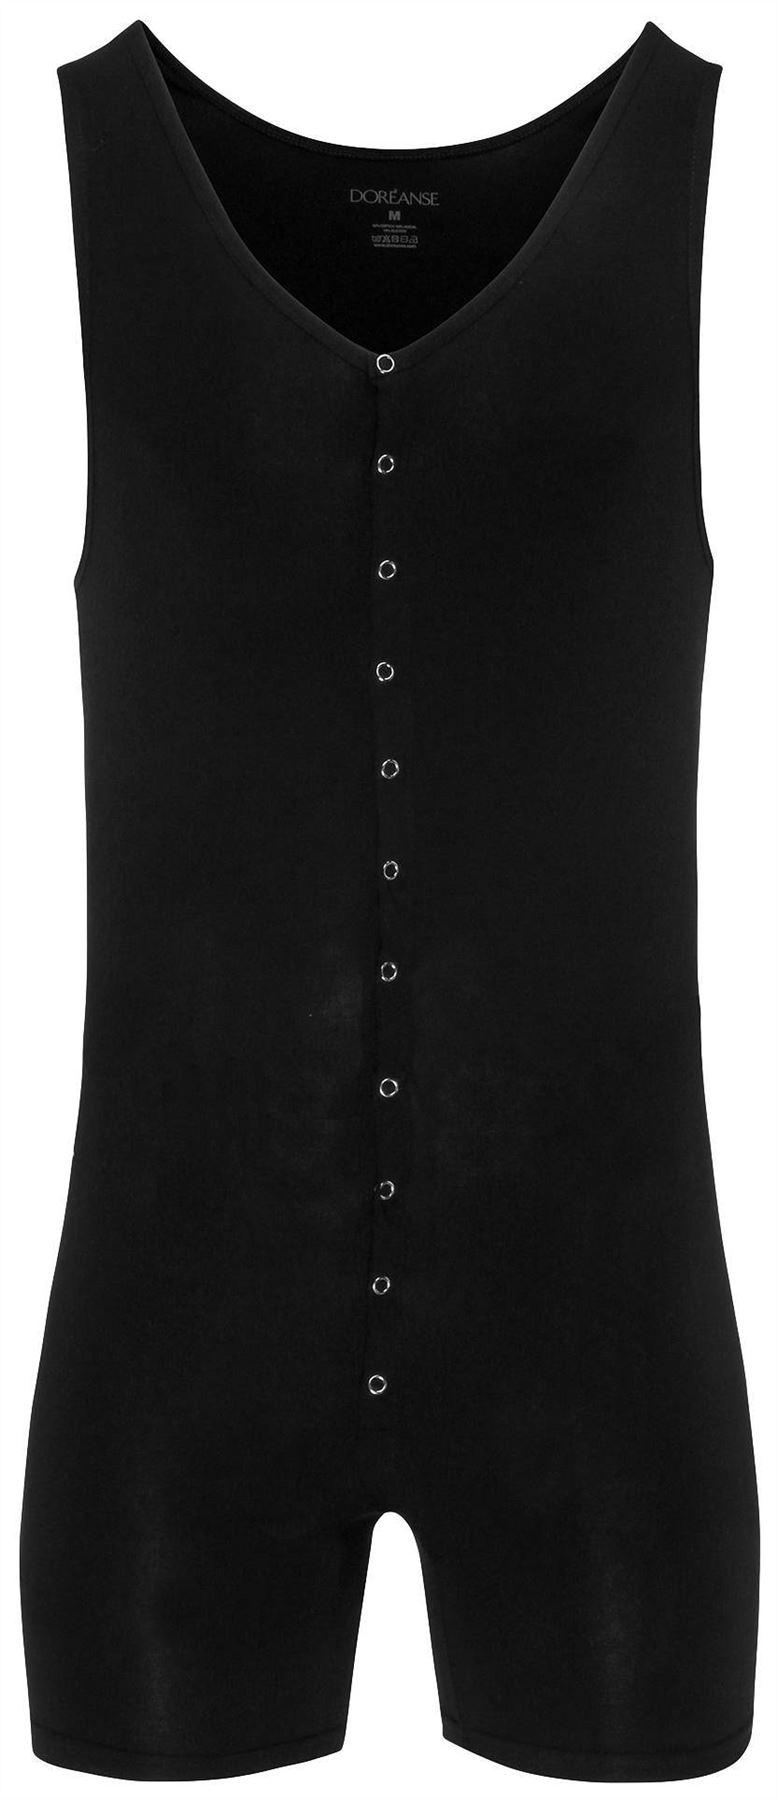 Doreanse Men/'s 5002 Soft Cotton Modal Boxer Body All in One